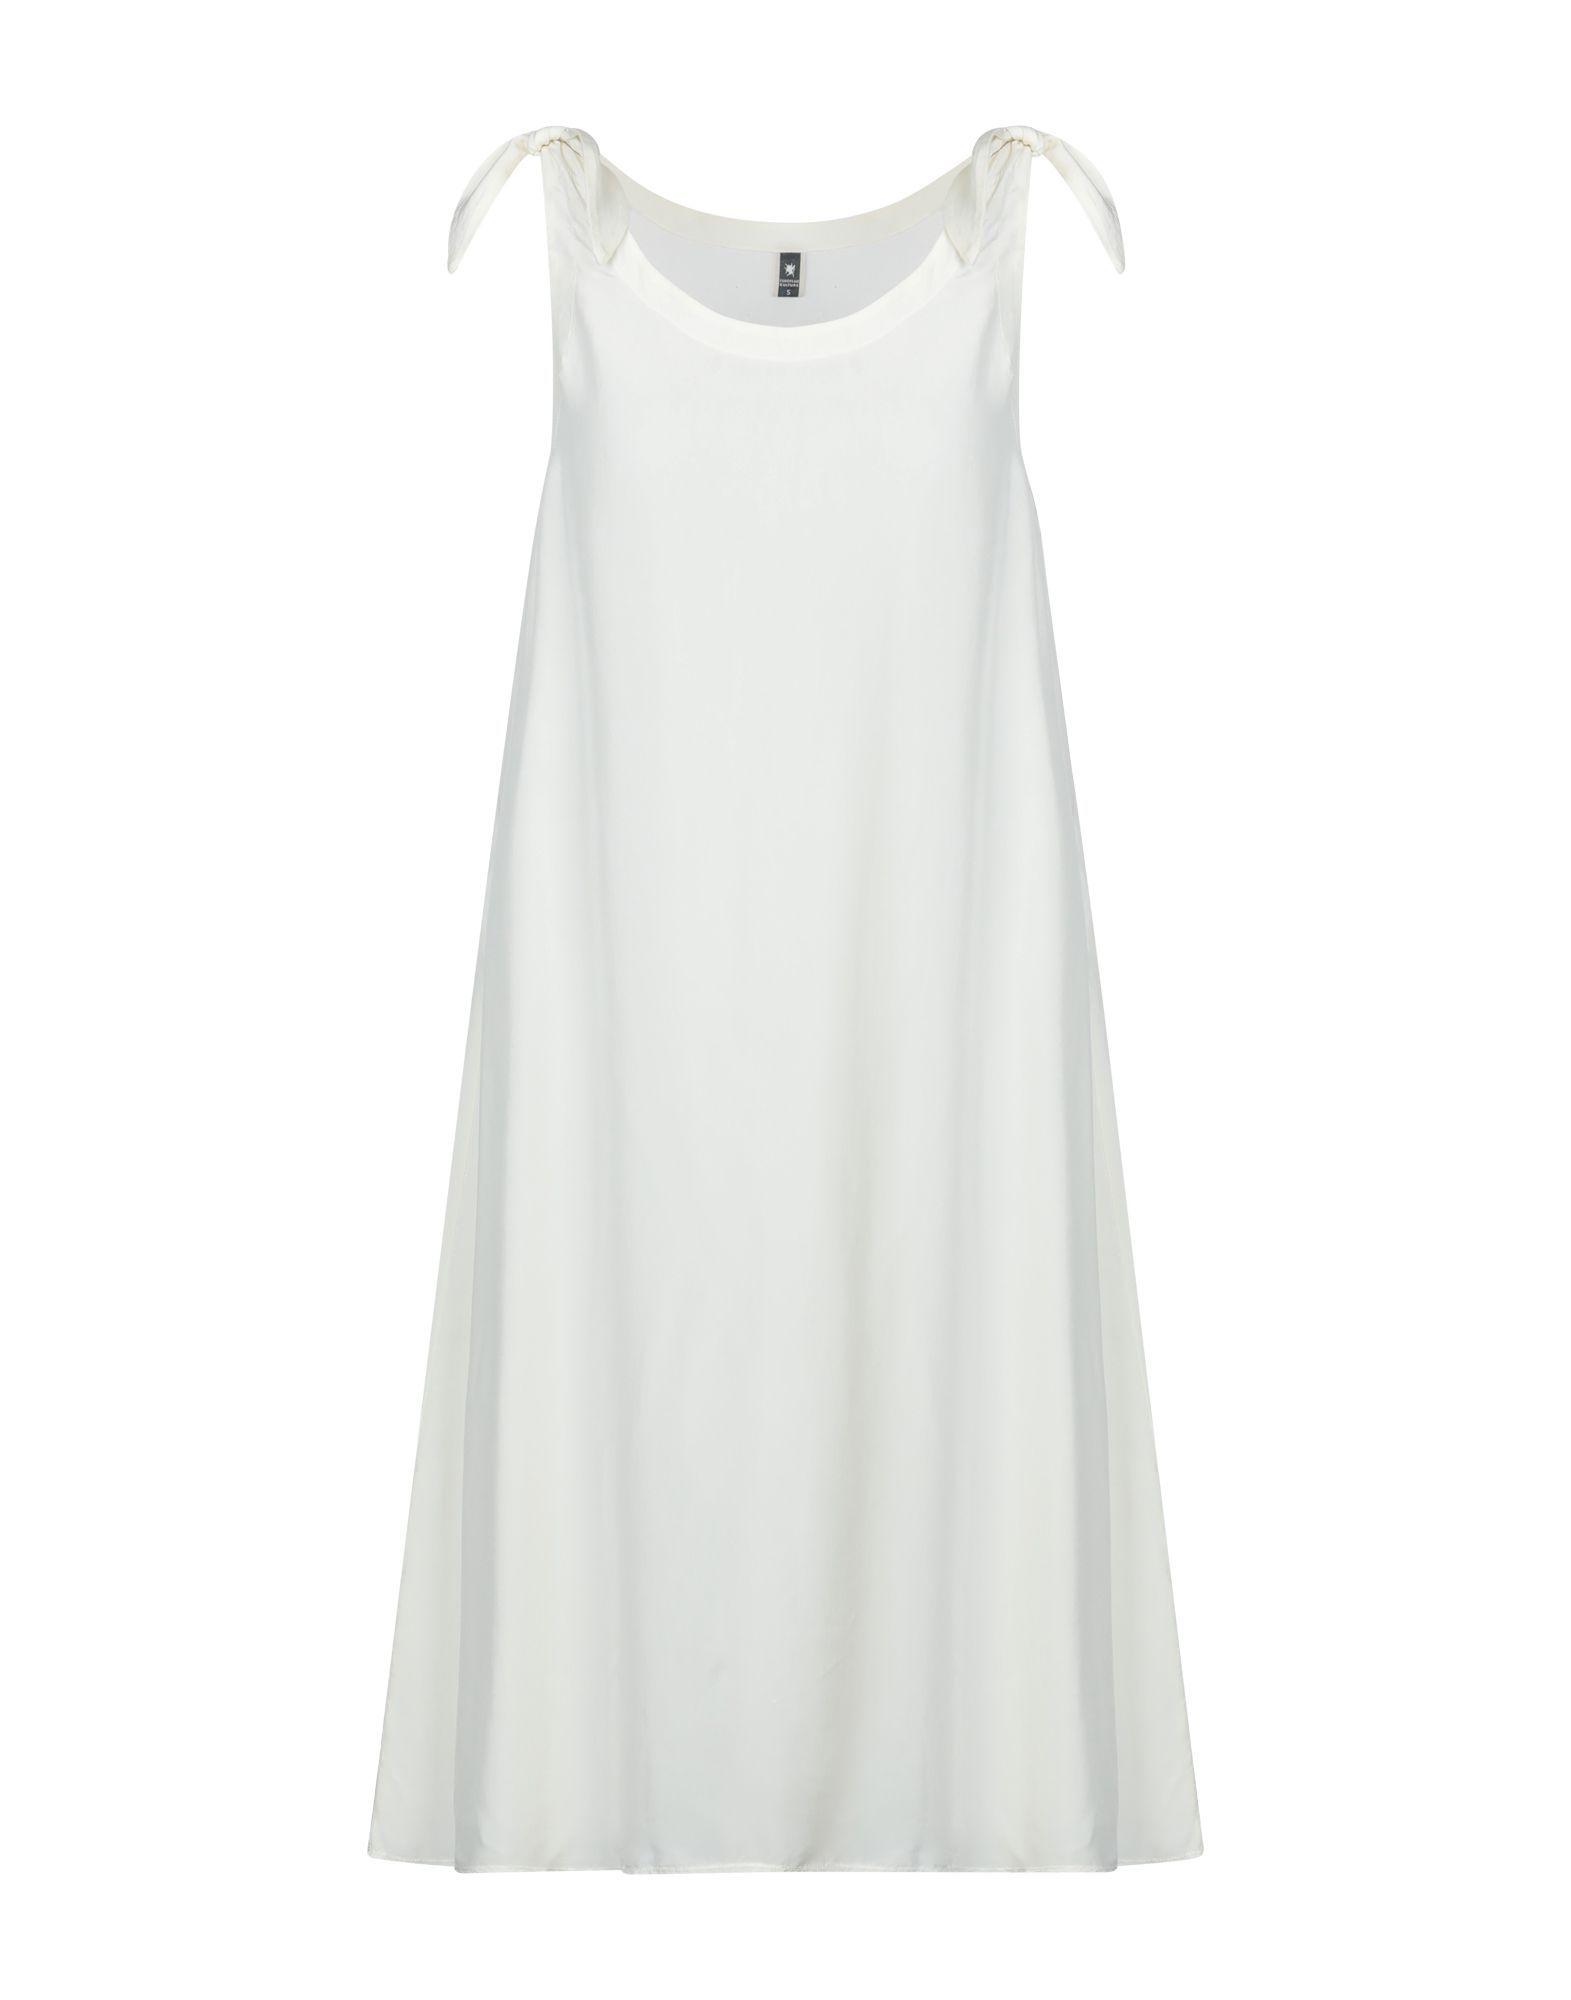 European Culture Ivory Satin Trapeze Style Dress